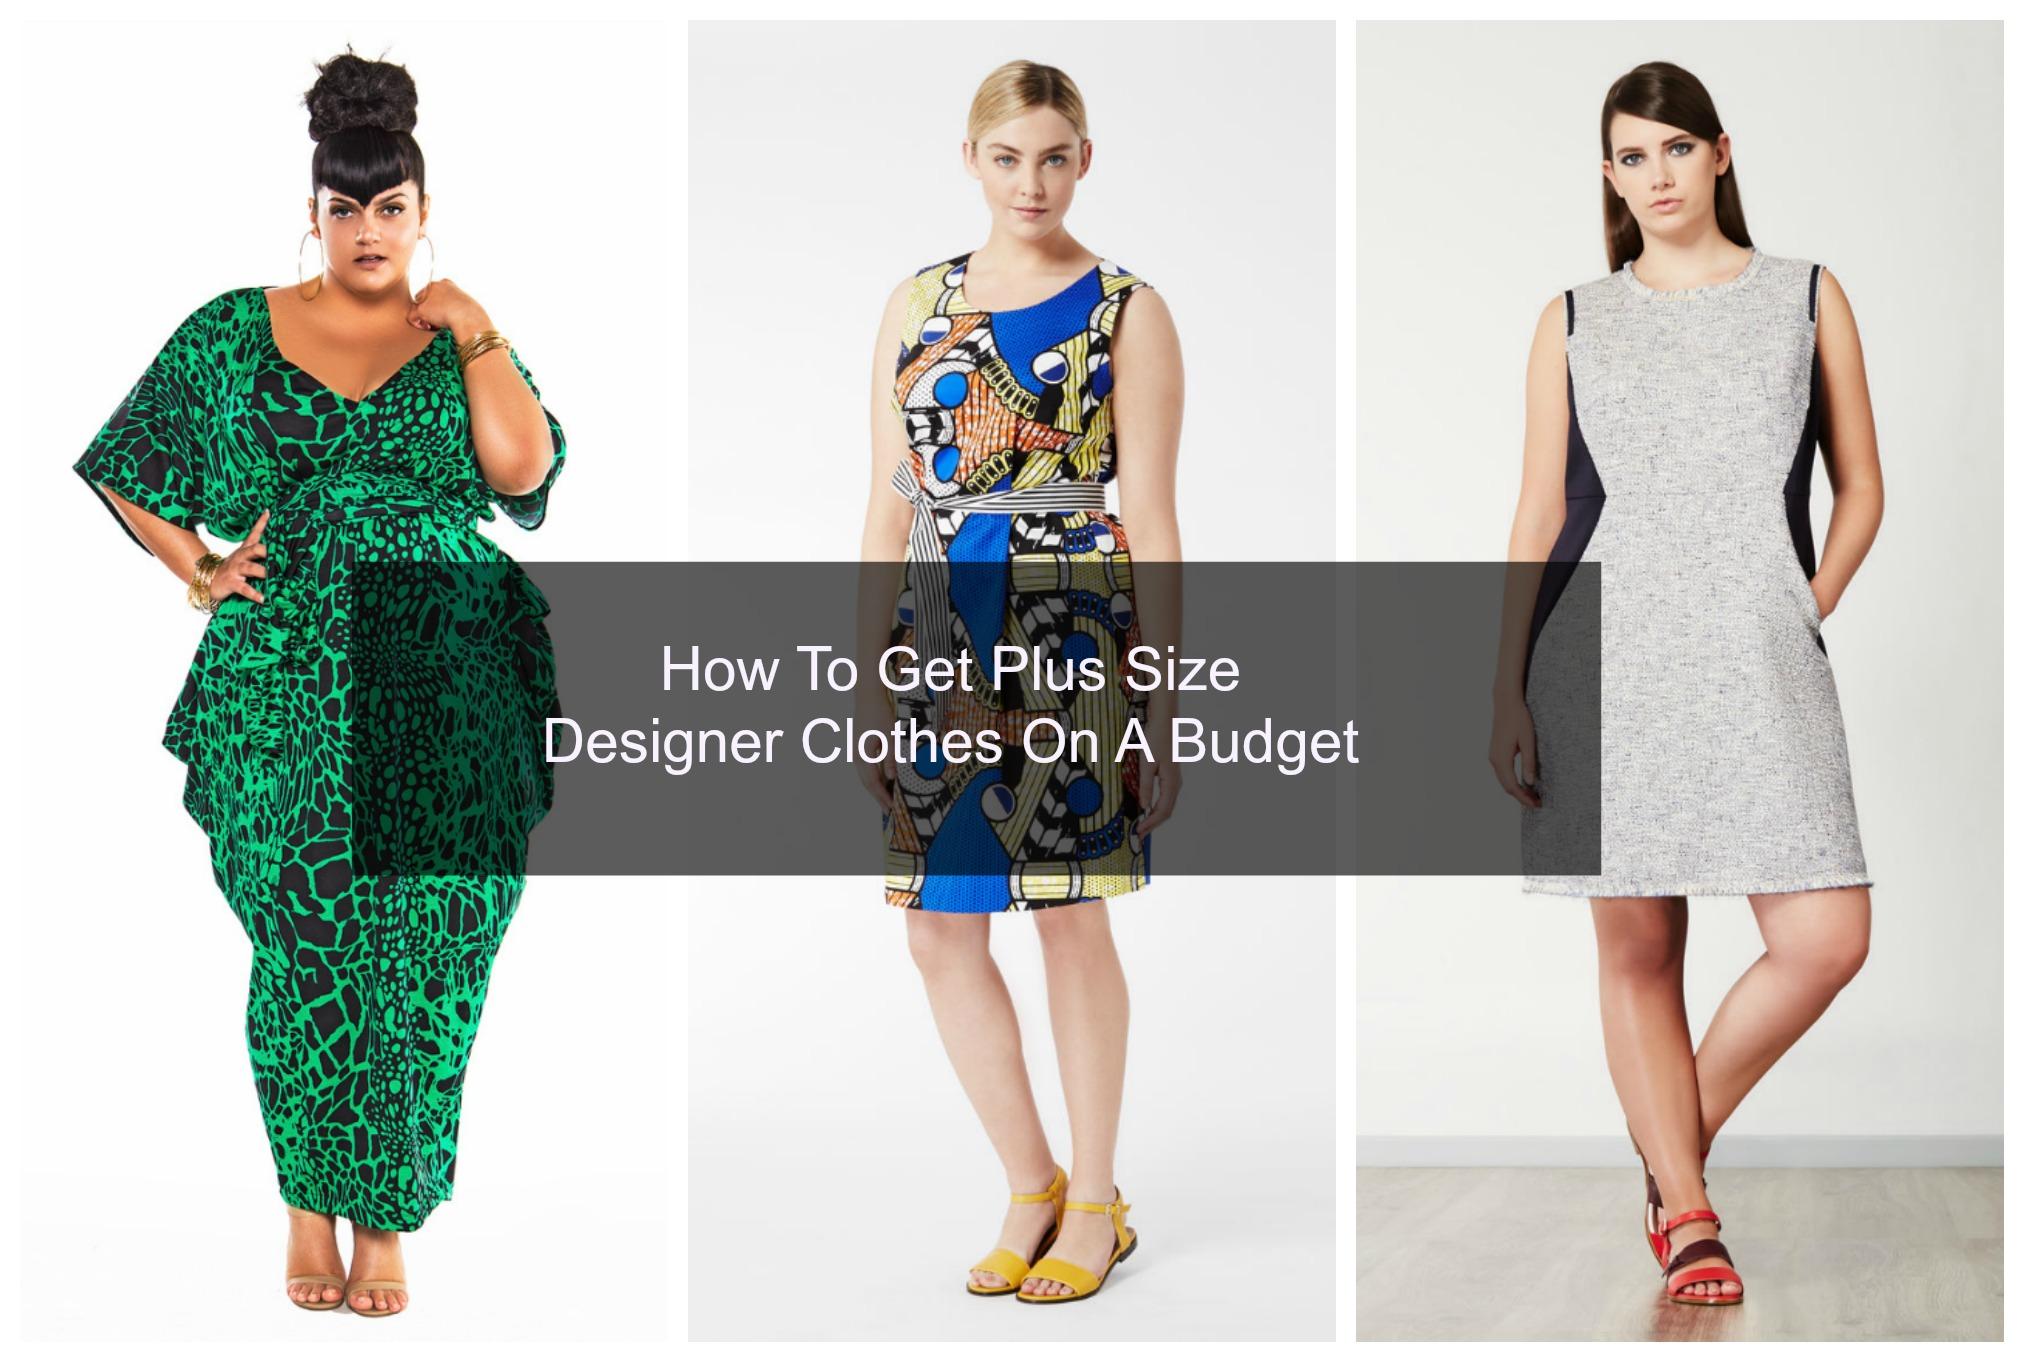 Designer Clothes On A Budget 2